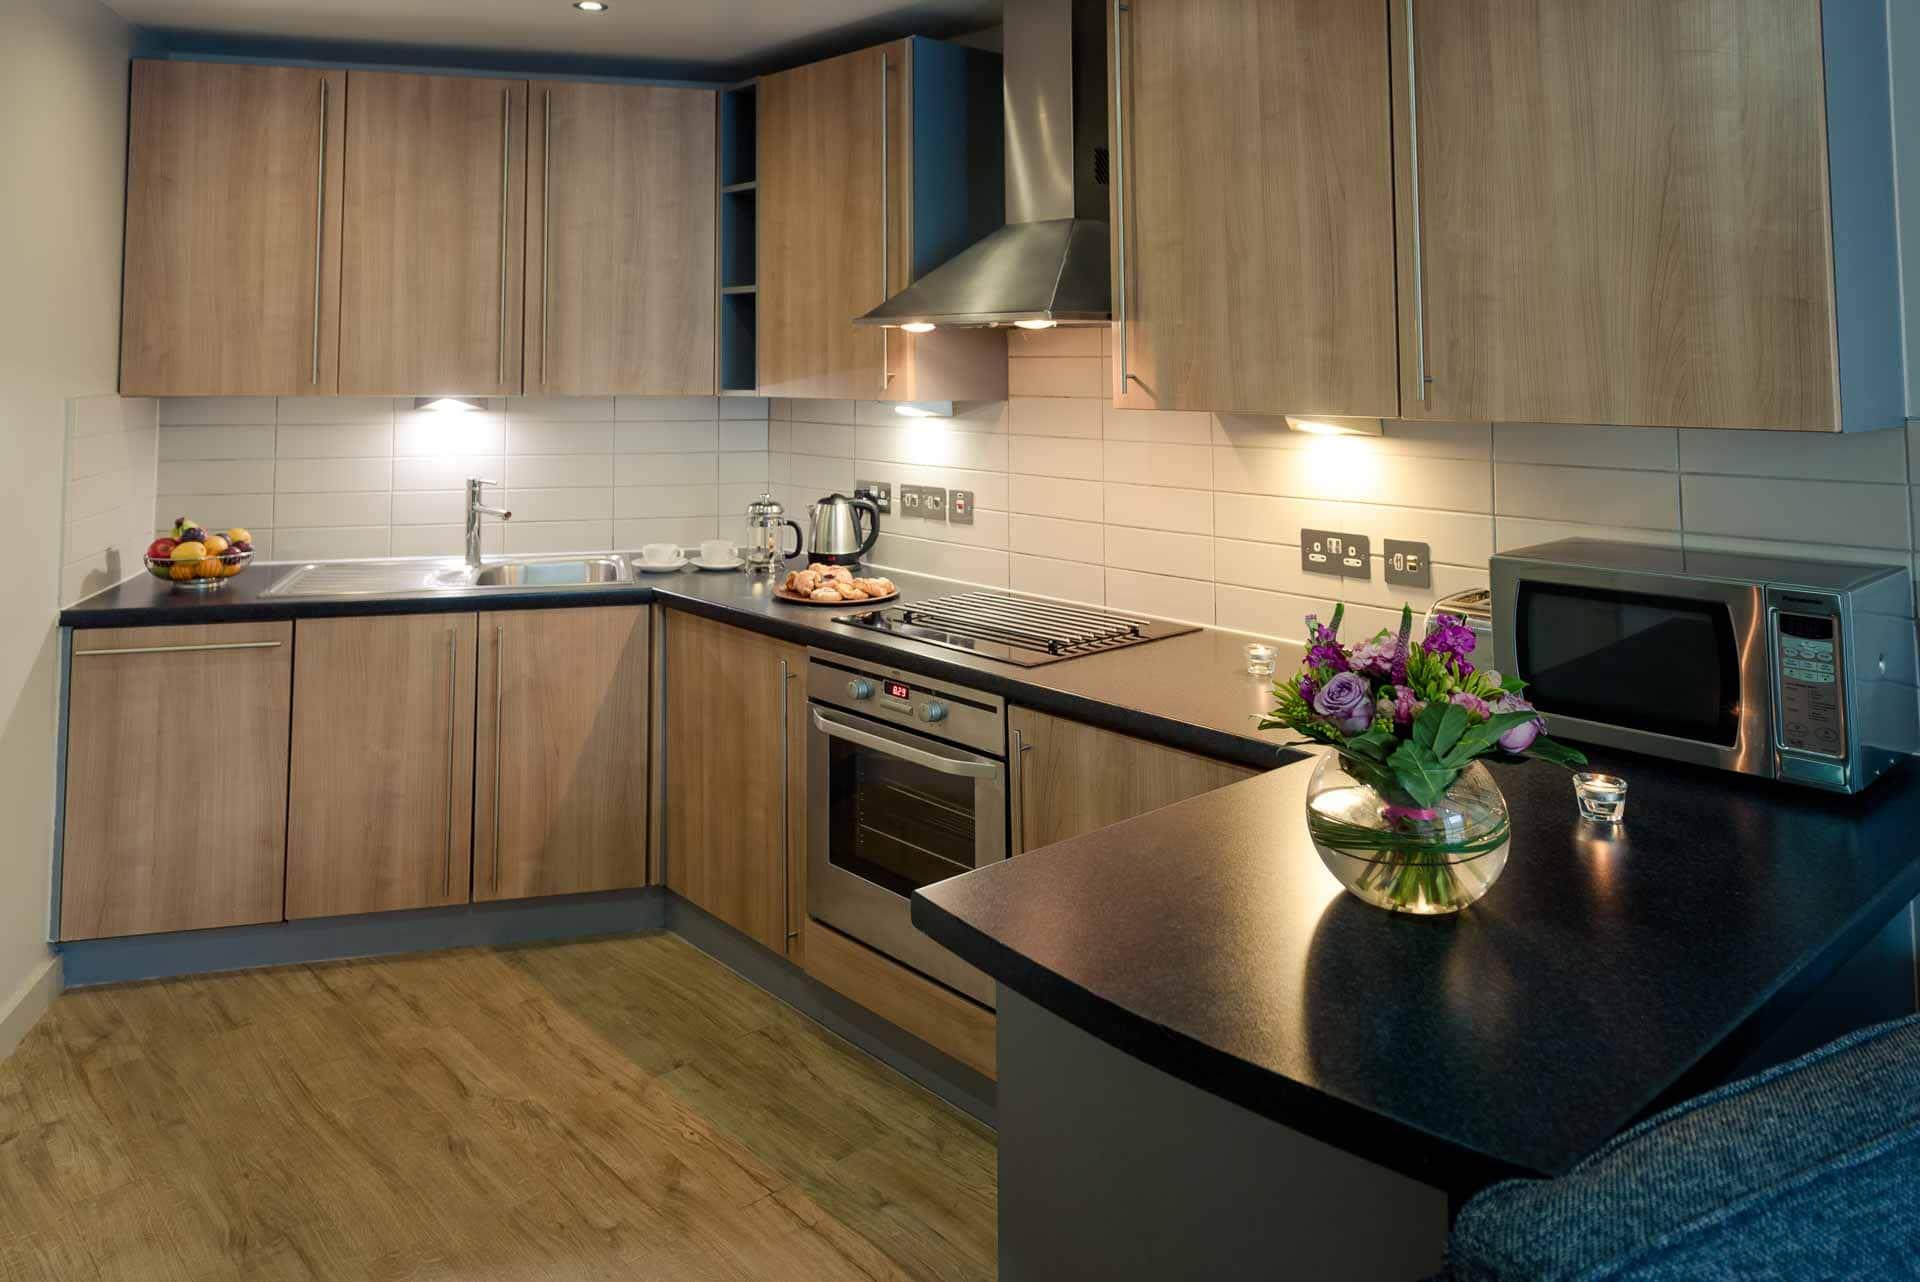 Kitchen at Premier Suites Liverpool, Centre, Liverpool - Citybase Apartments